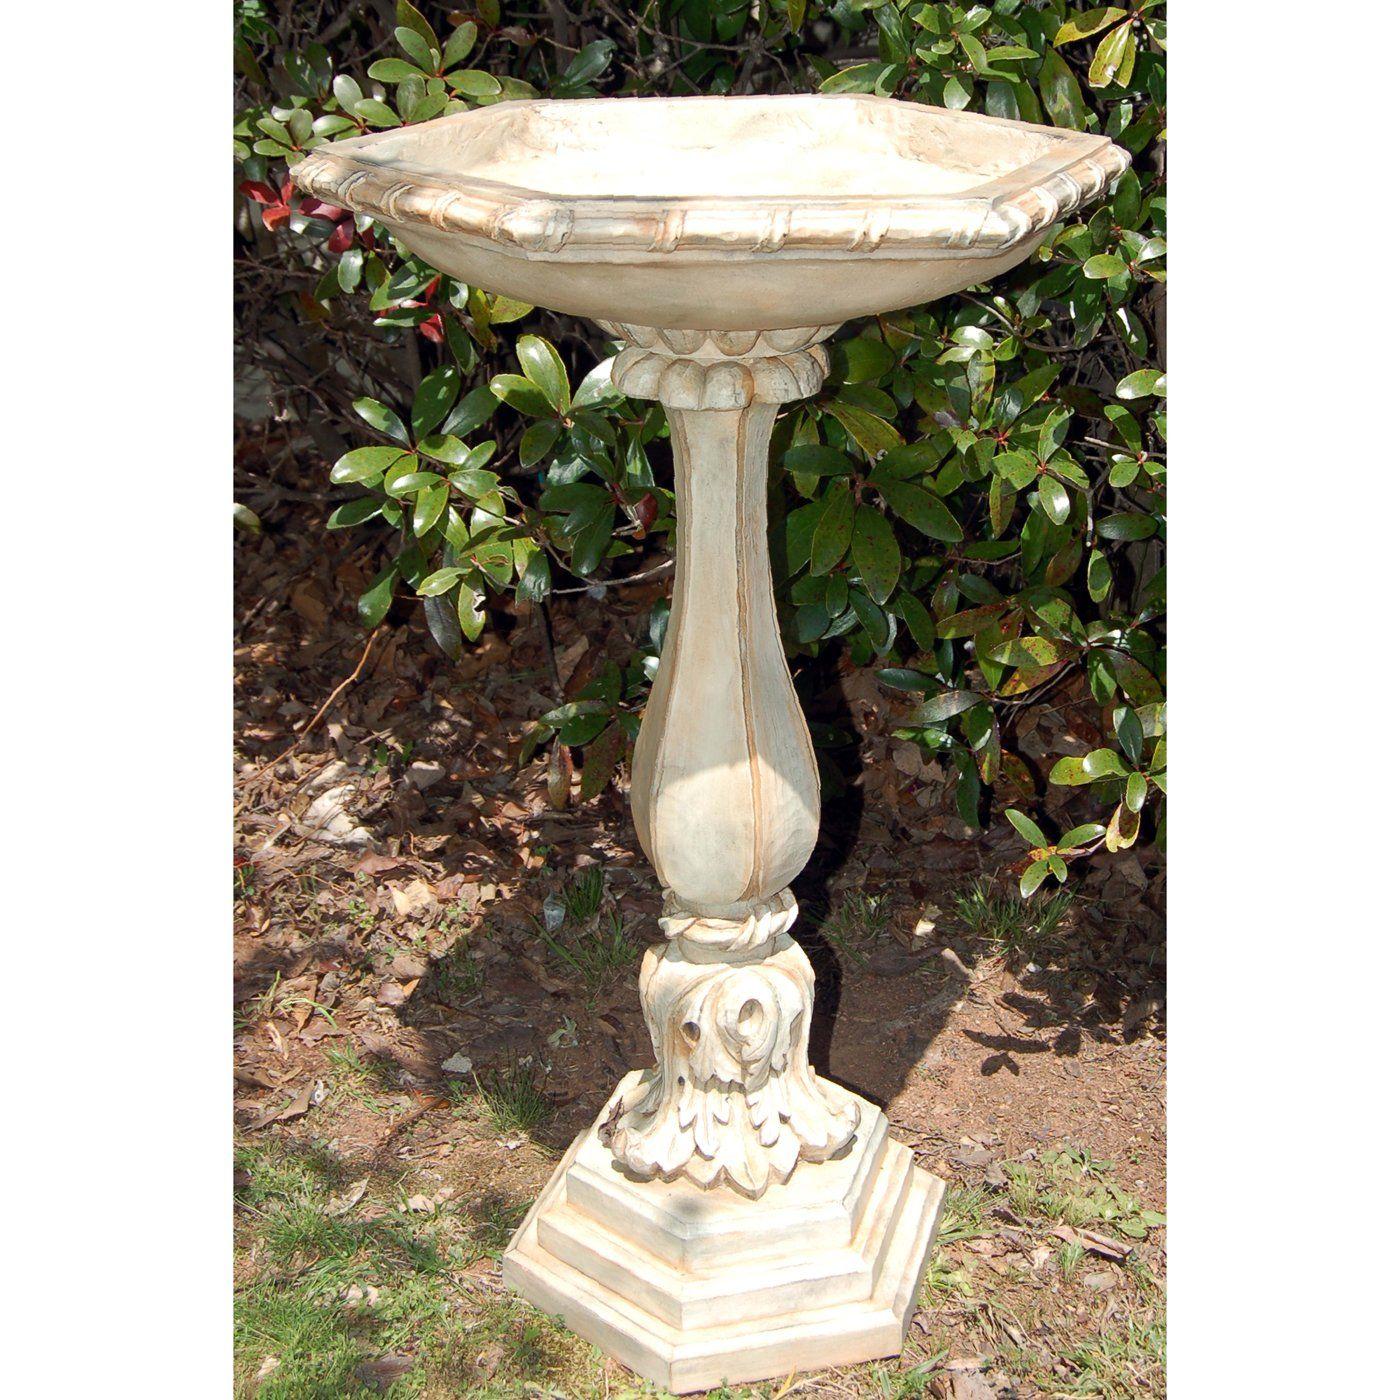 potspillarscolumns columns in pillars high statues pedestal garden s item bretsgardenstatues pots bret